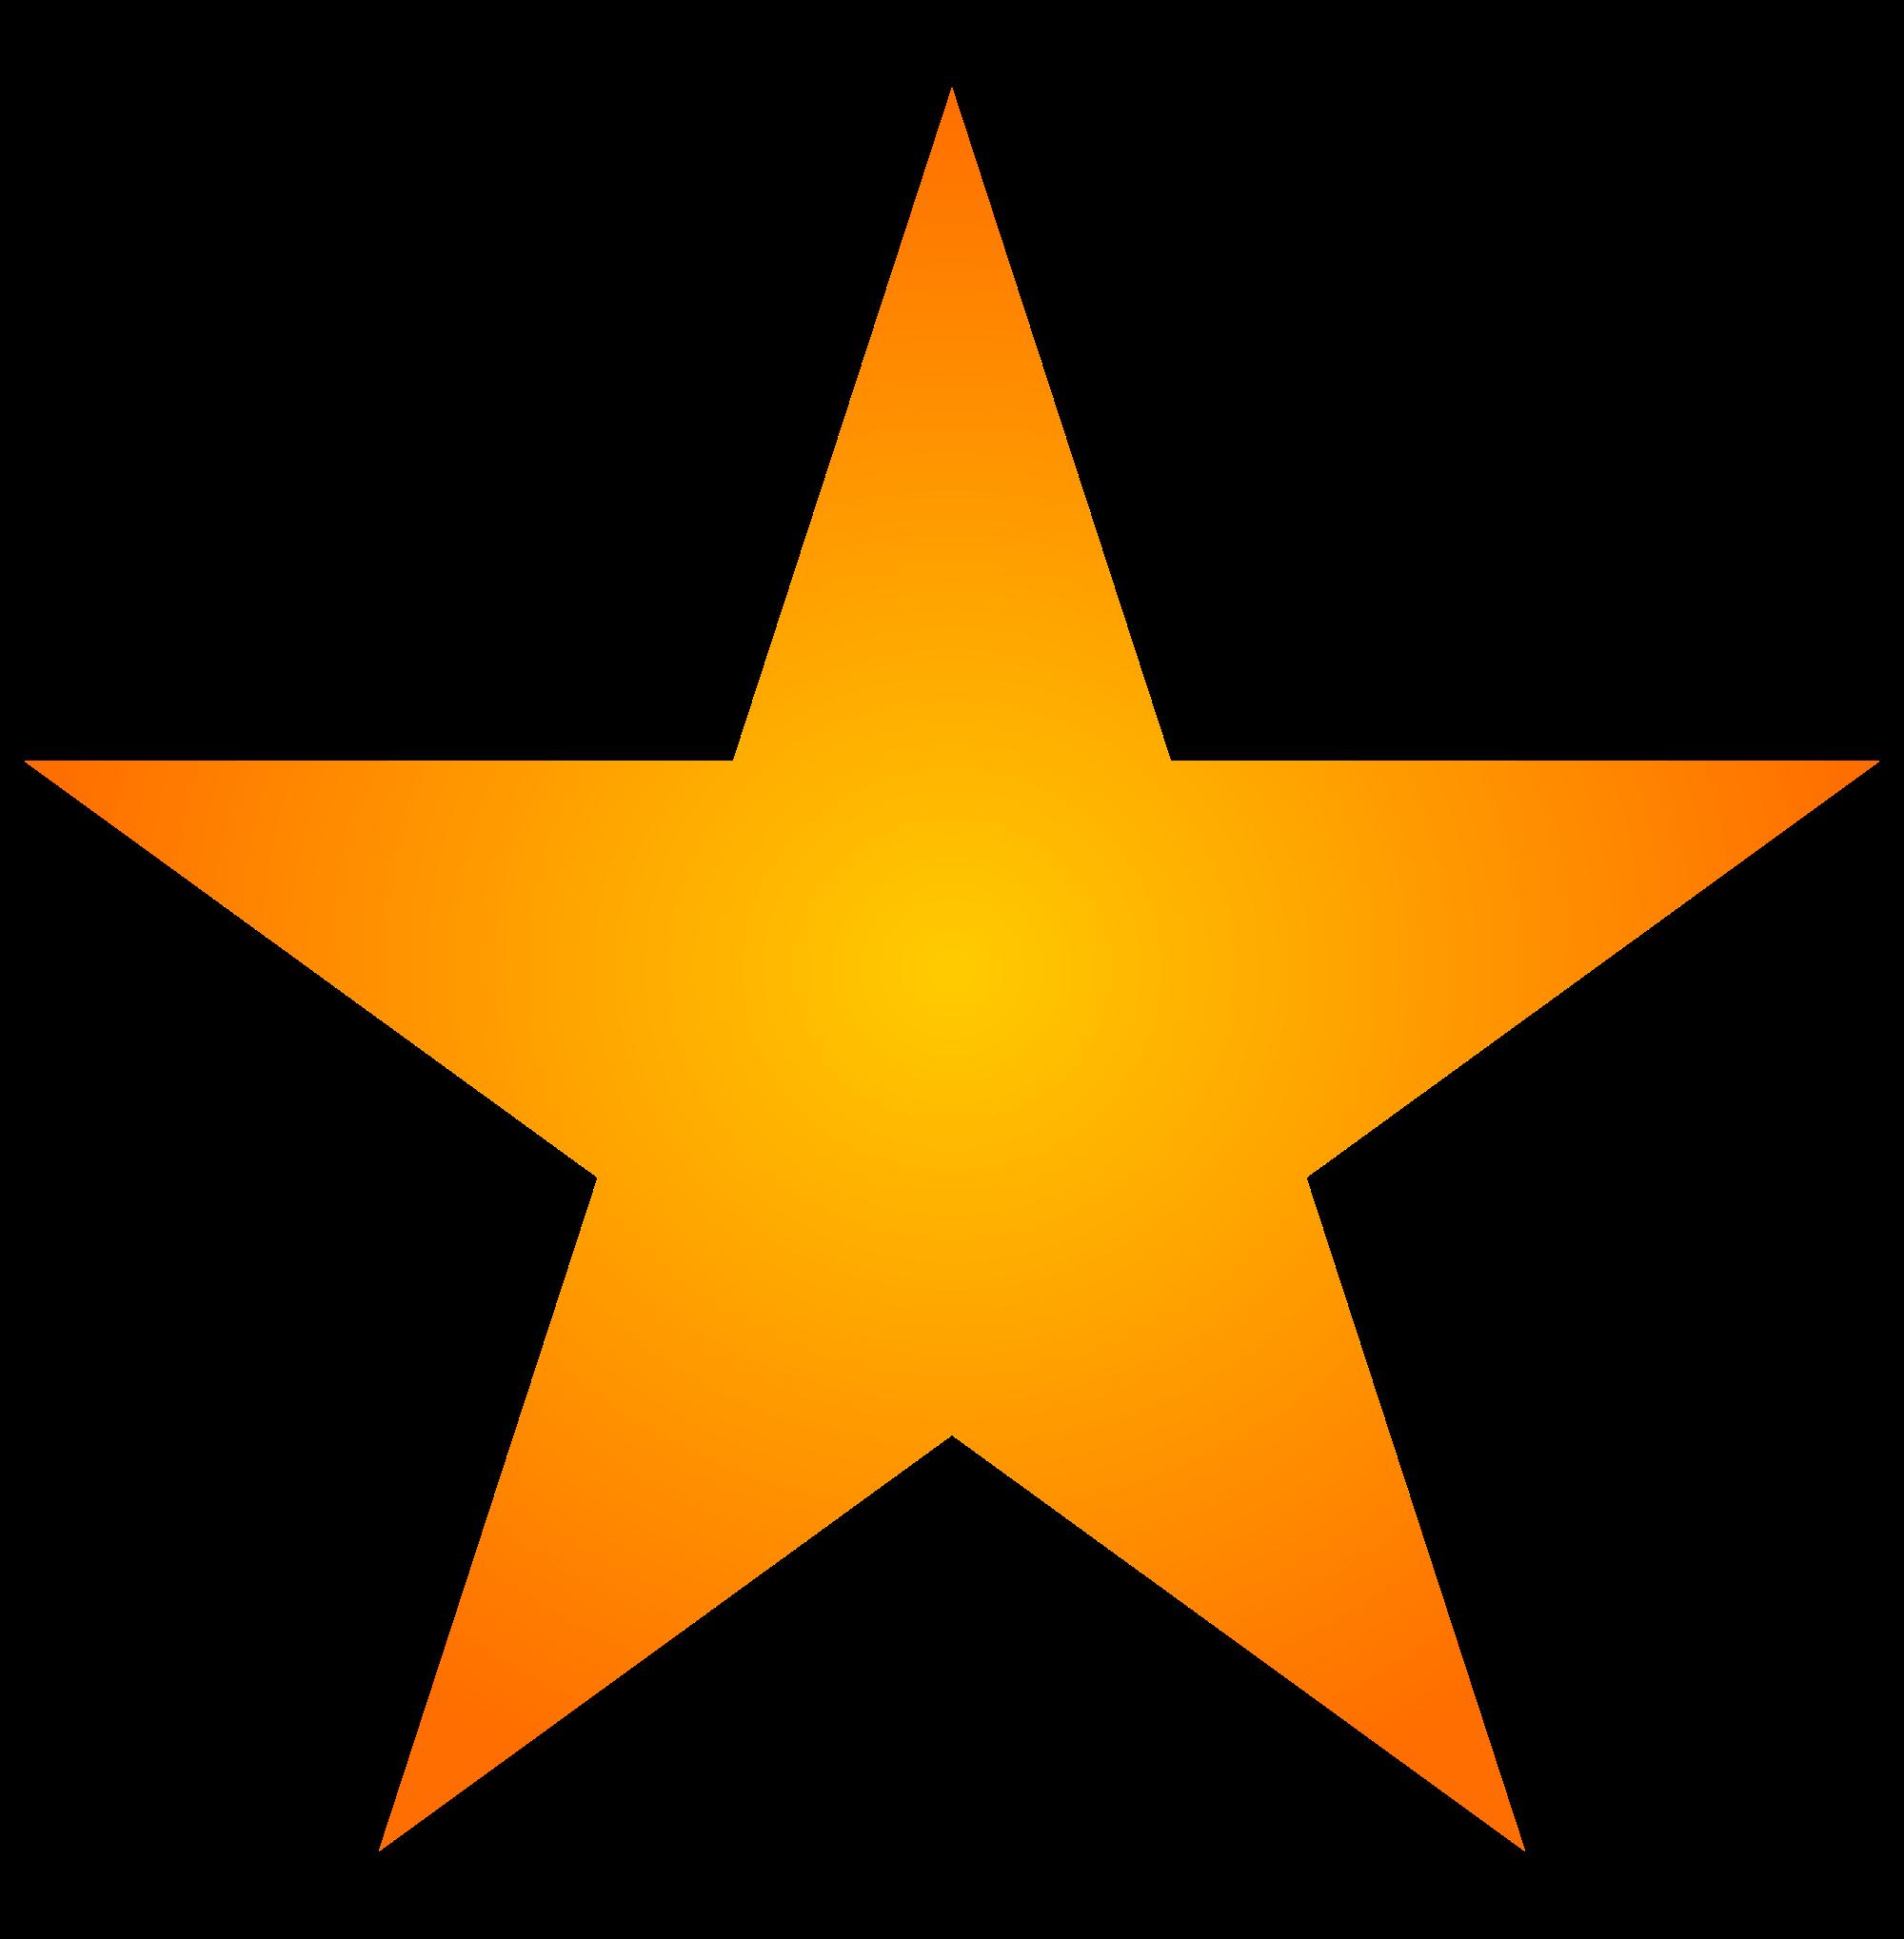 Orange star clipart clipart free download Download Png Image Star Orange Color clipart free download